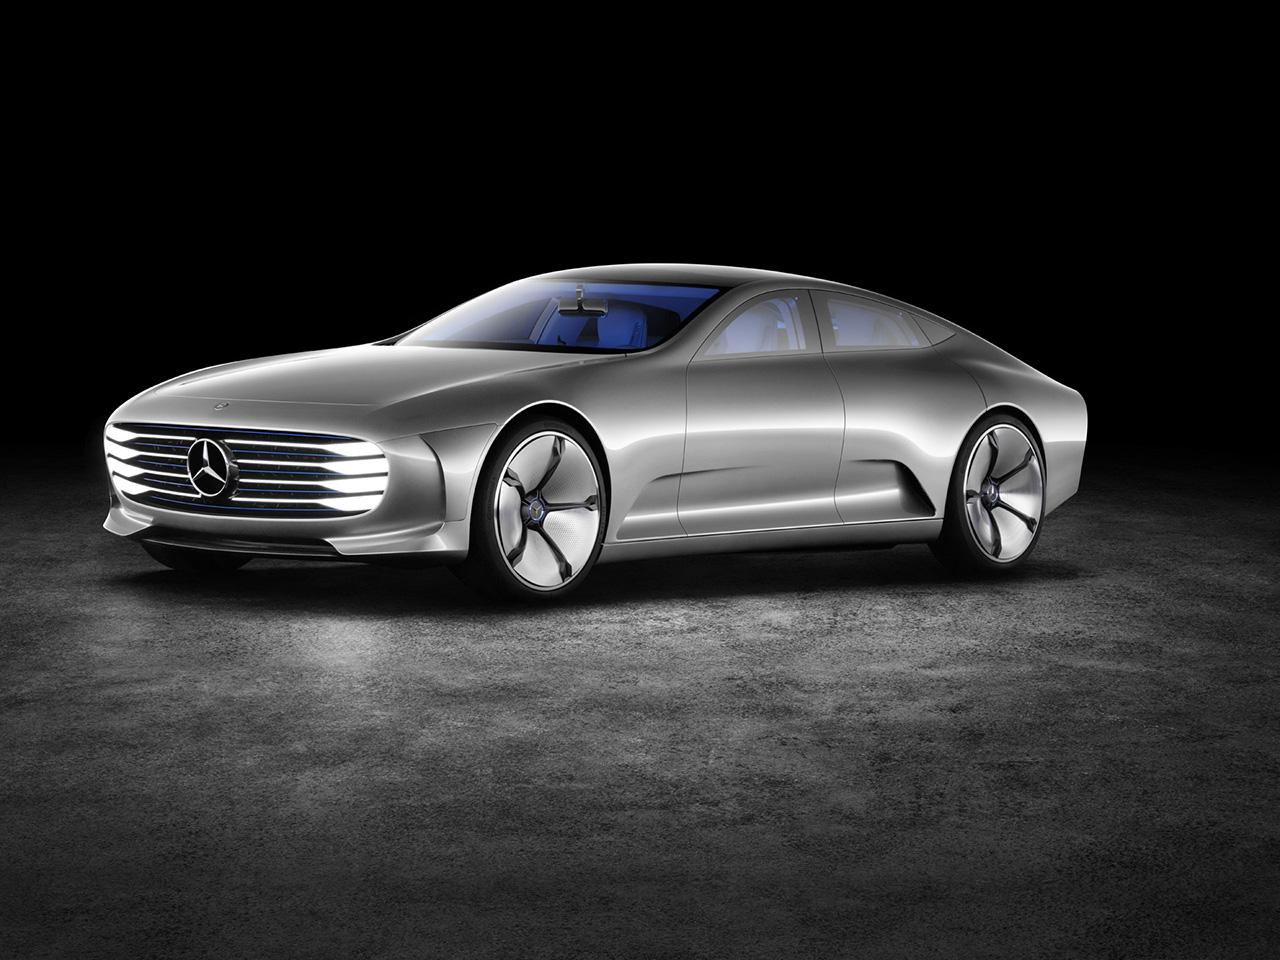 2015 Mercedes-Benz Intelligent Aerodynamic Automobile Concept